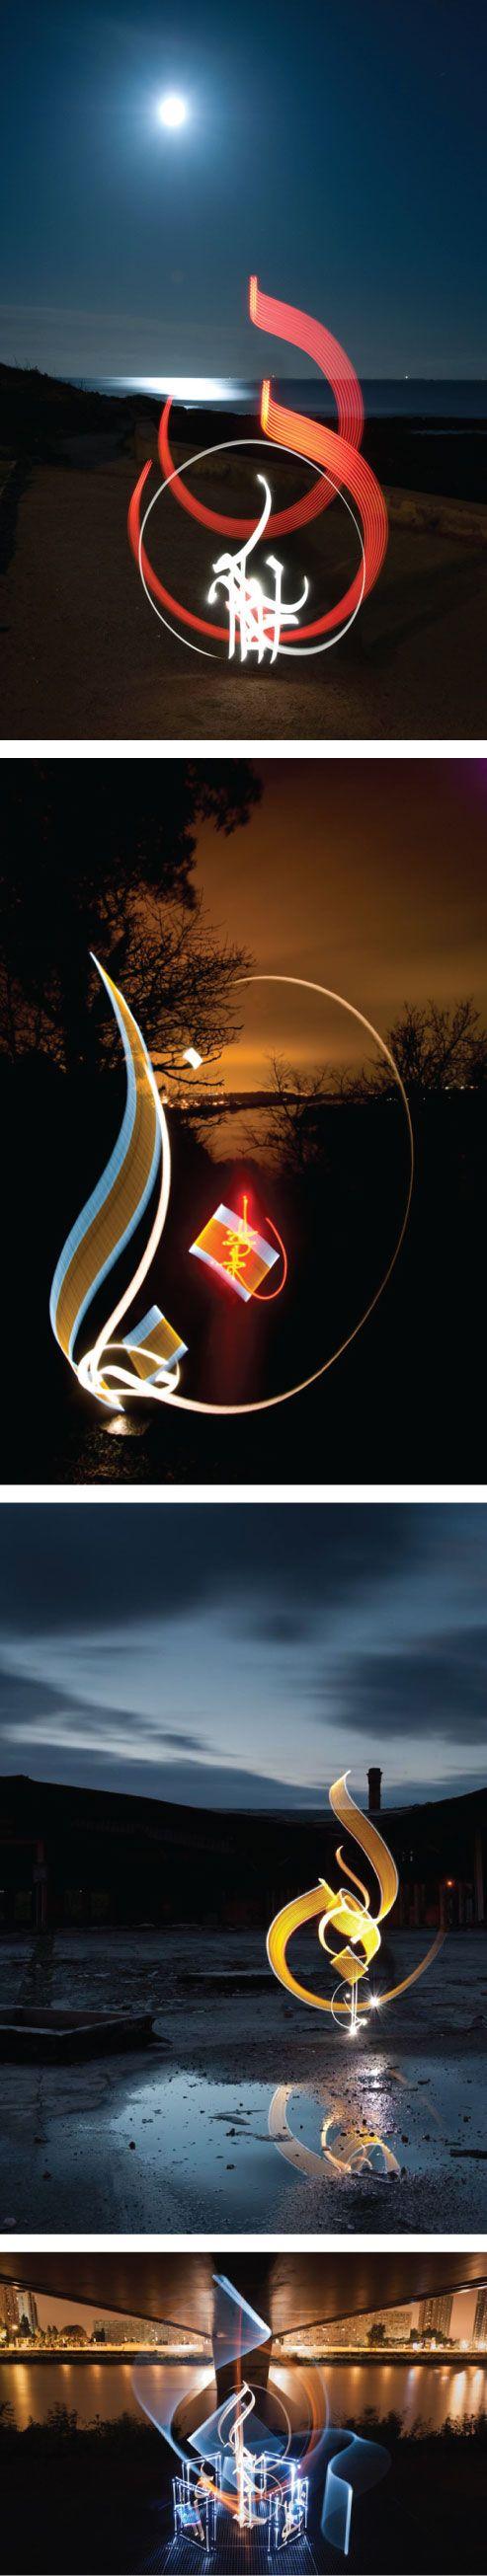 Illuminated Arabic Calligraphy by Artist Julien Breton and photographer David Gallard